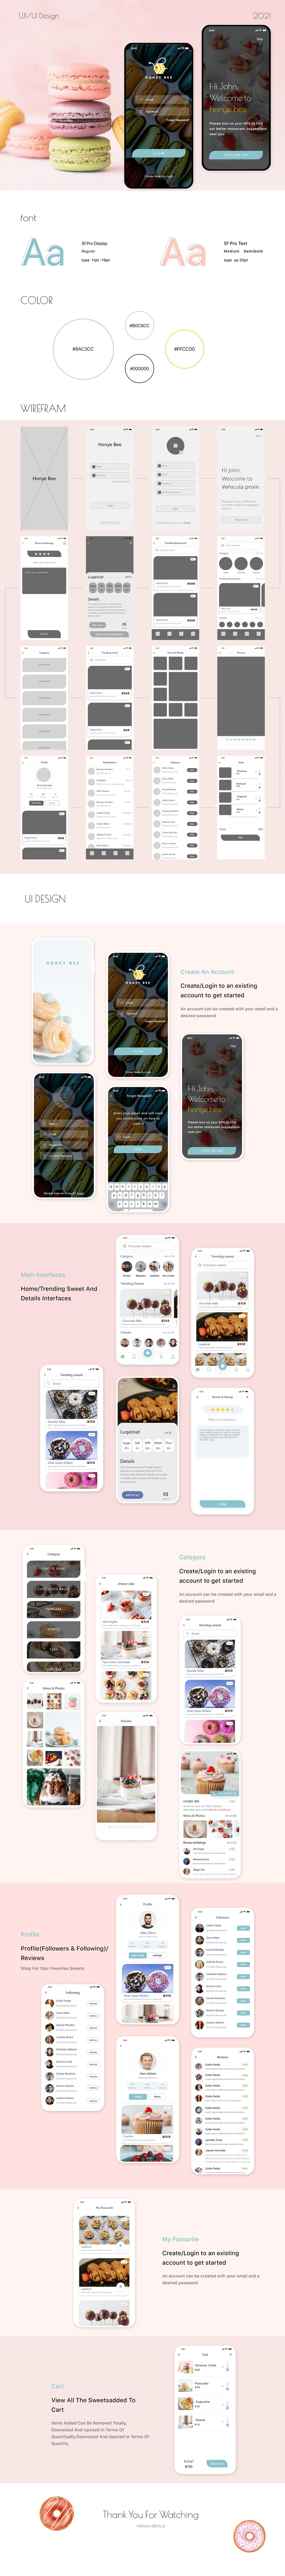 app Interface iphone Mockup sweet UI ui design ux